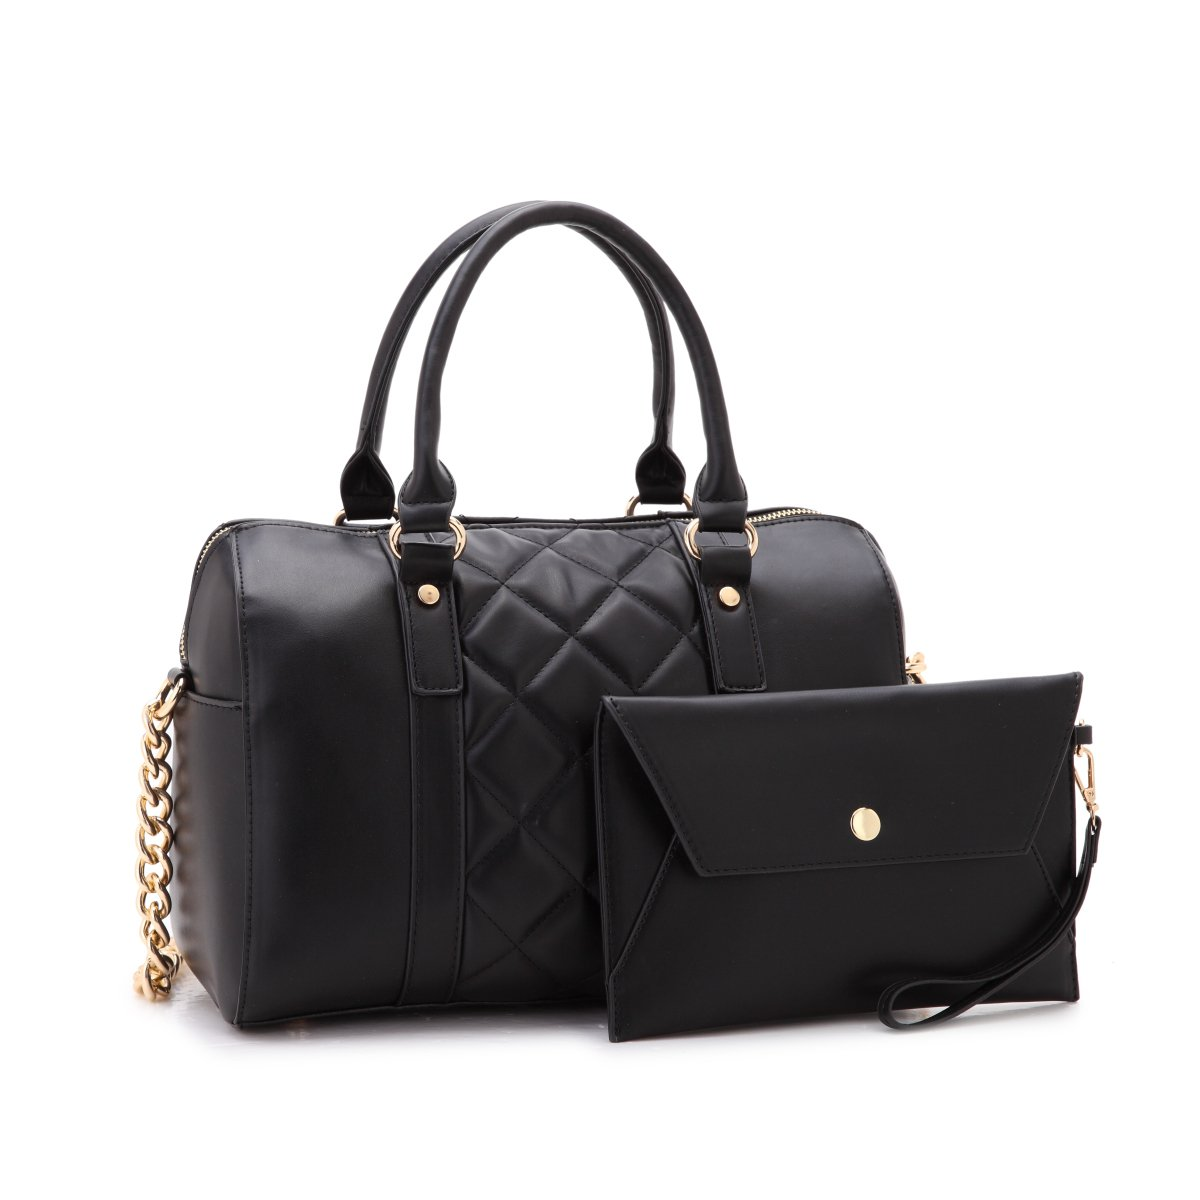 MMK Collection Fashion Satchel handbag~(7566/7370) Soft/Patent Vegan Leather~Beautiful Designer Purse~Perfect Shoulder Bag~Fashion handbag Set for Women(Matching Wallet Set 7566 Black)